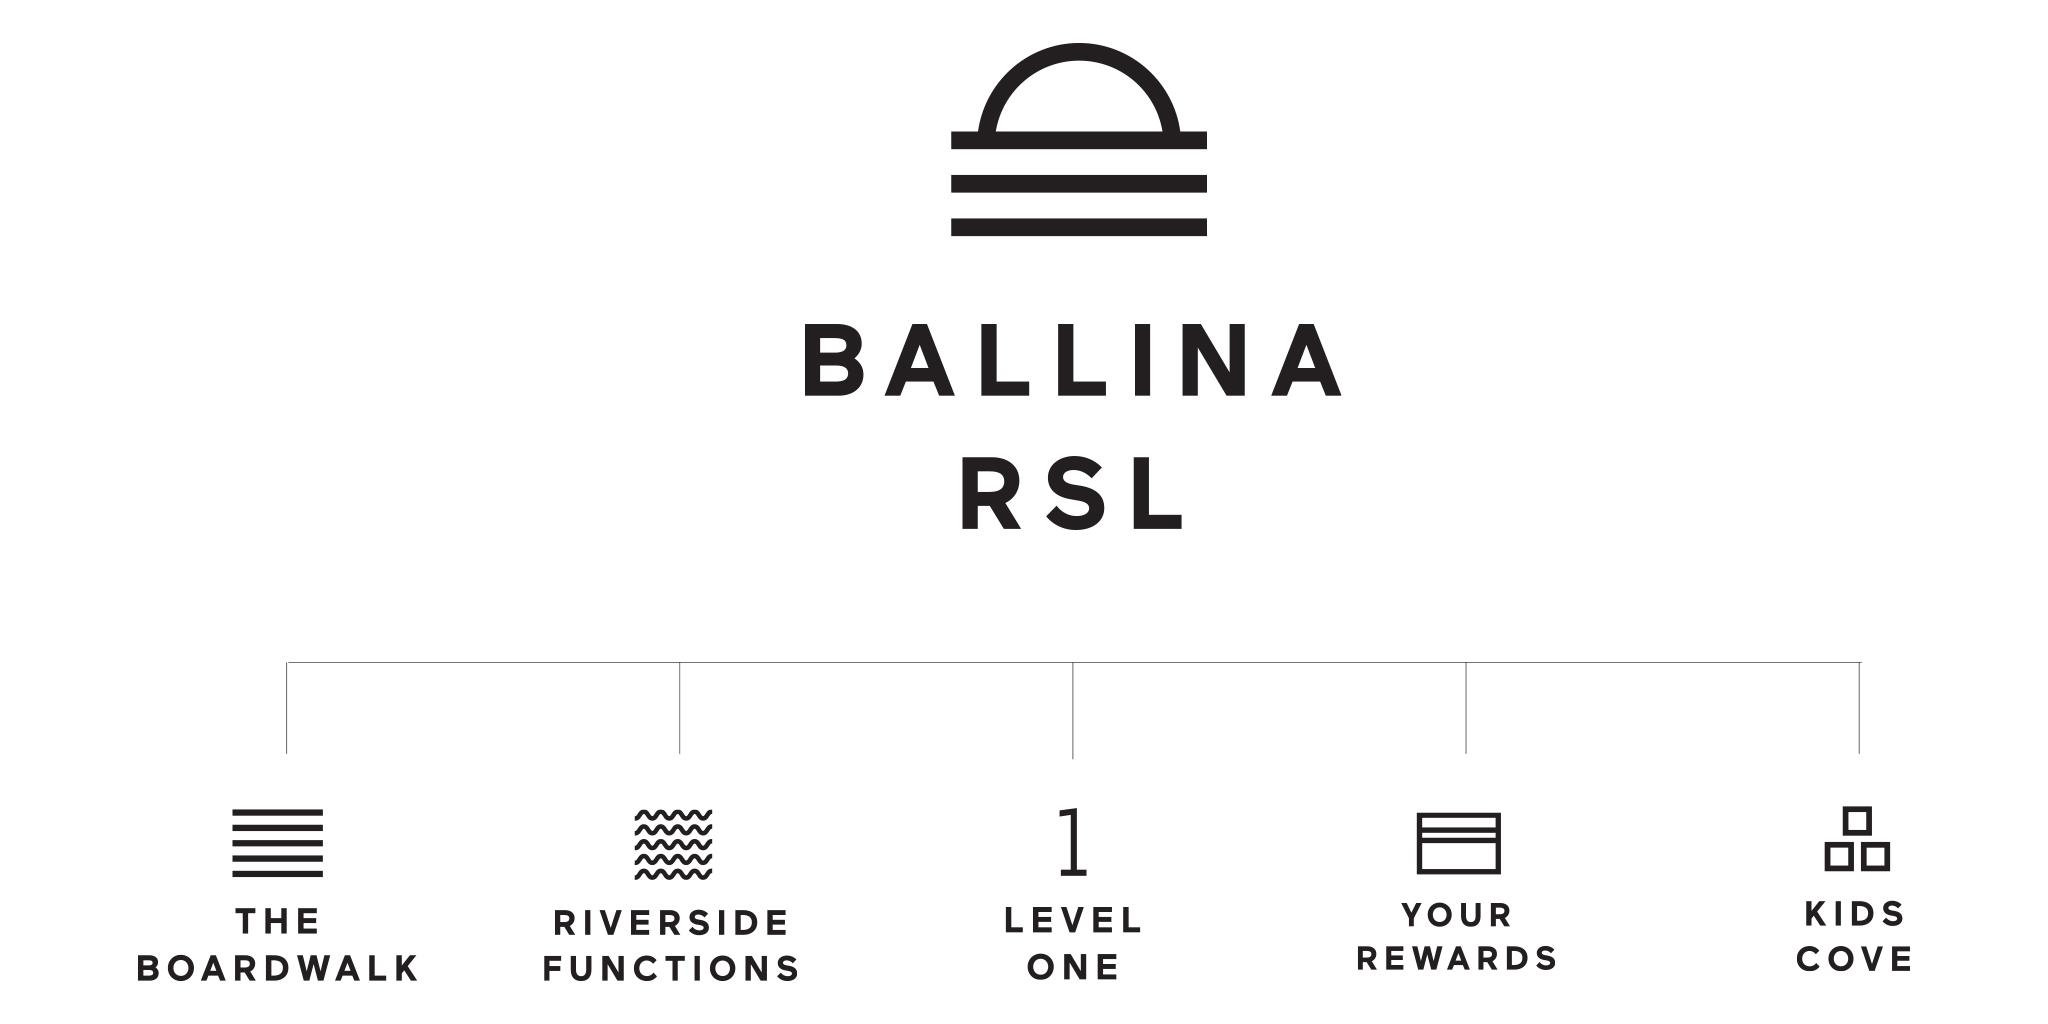 Ballina RSL Logo Hierarchy